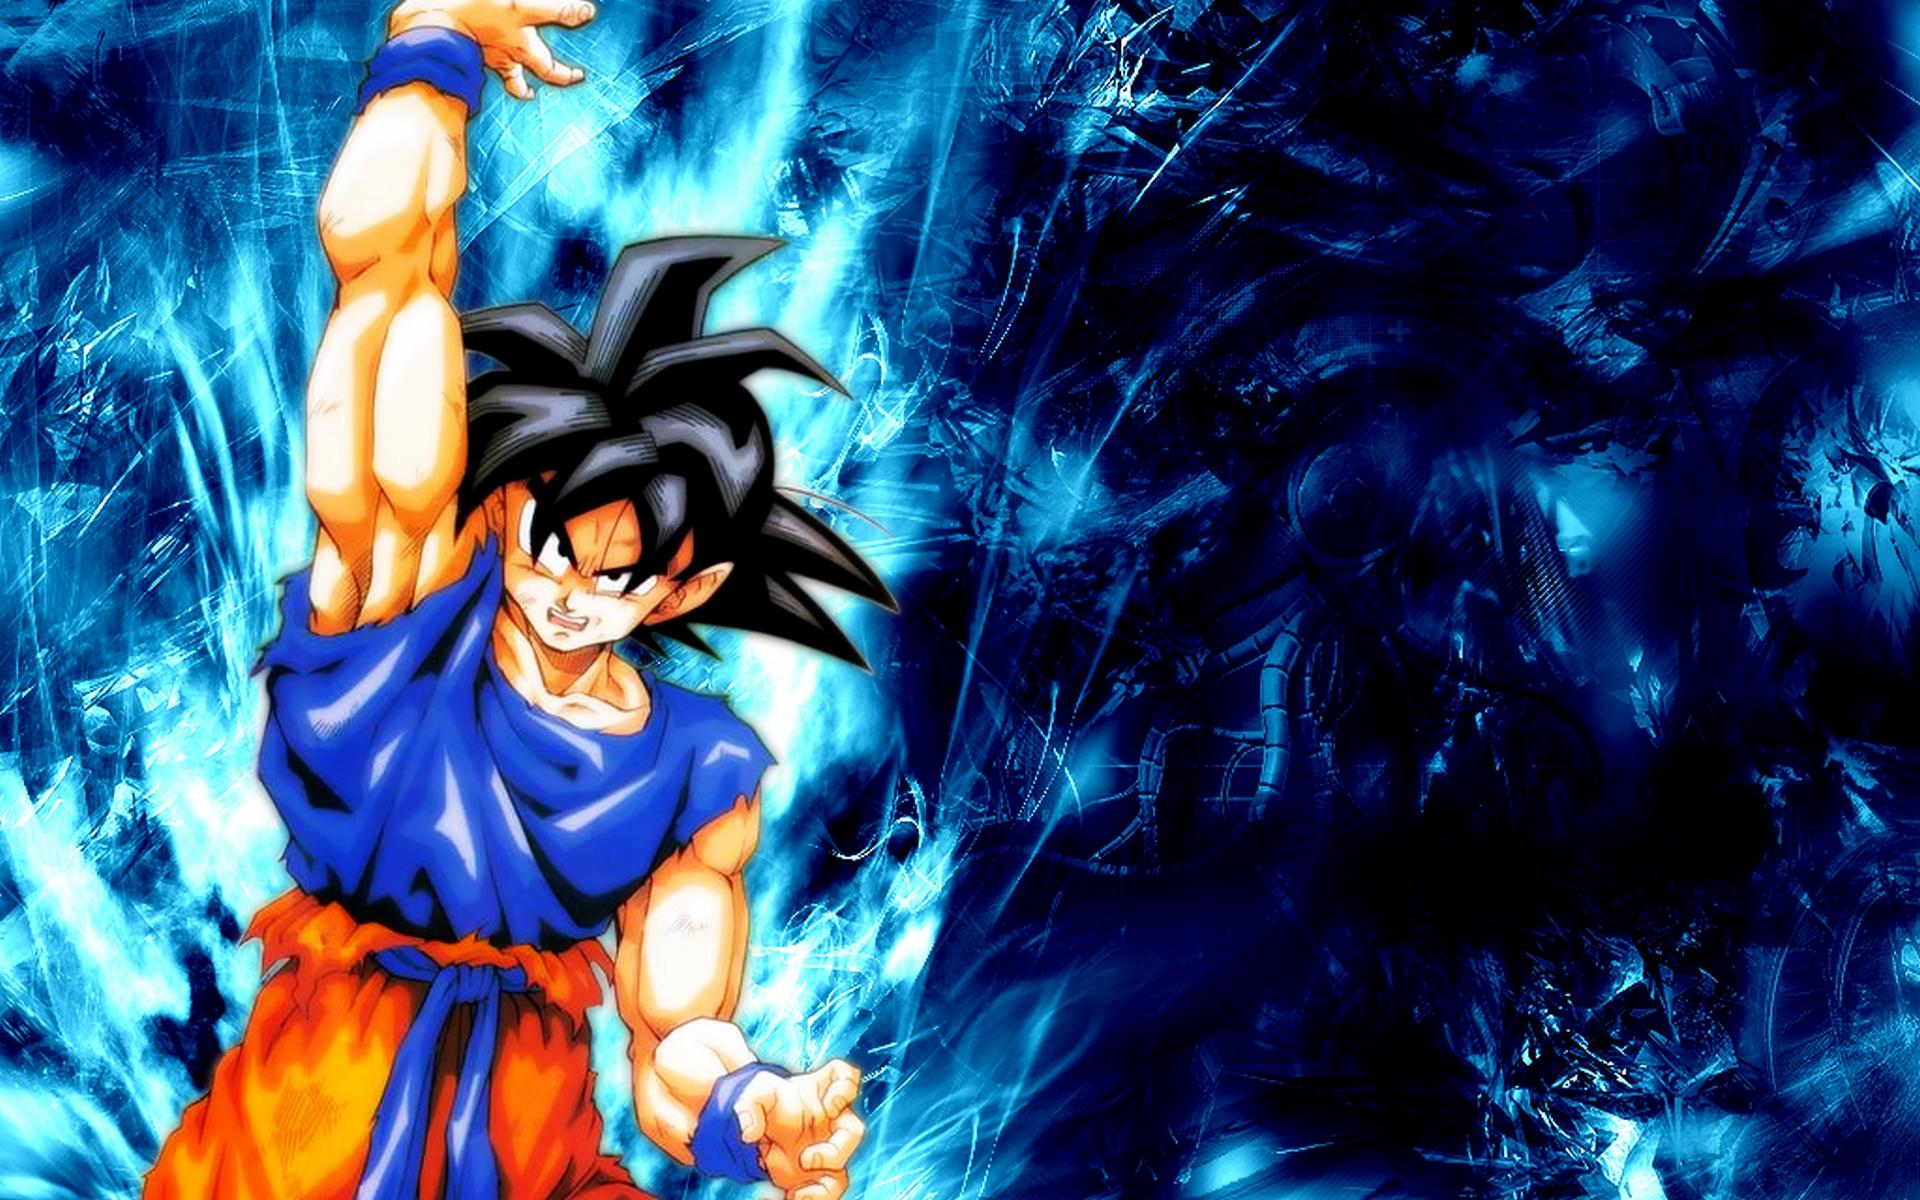 Dbz Wallpaper Goku Goku Wallpaper Dragon Ball Z 71848 Hd